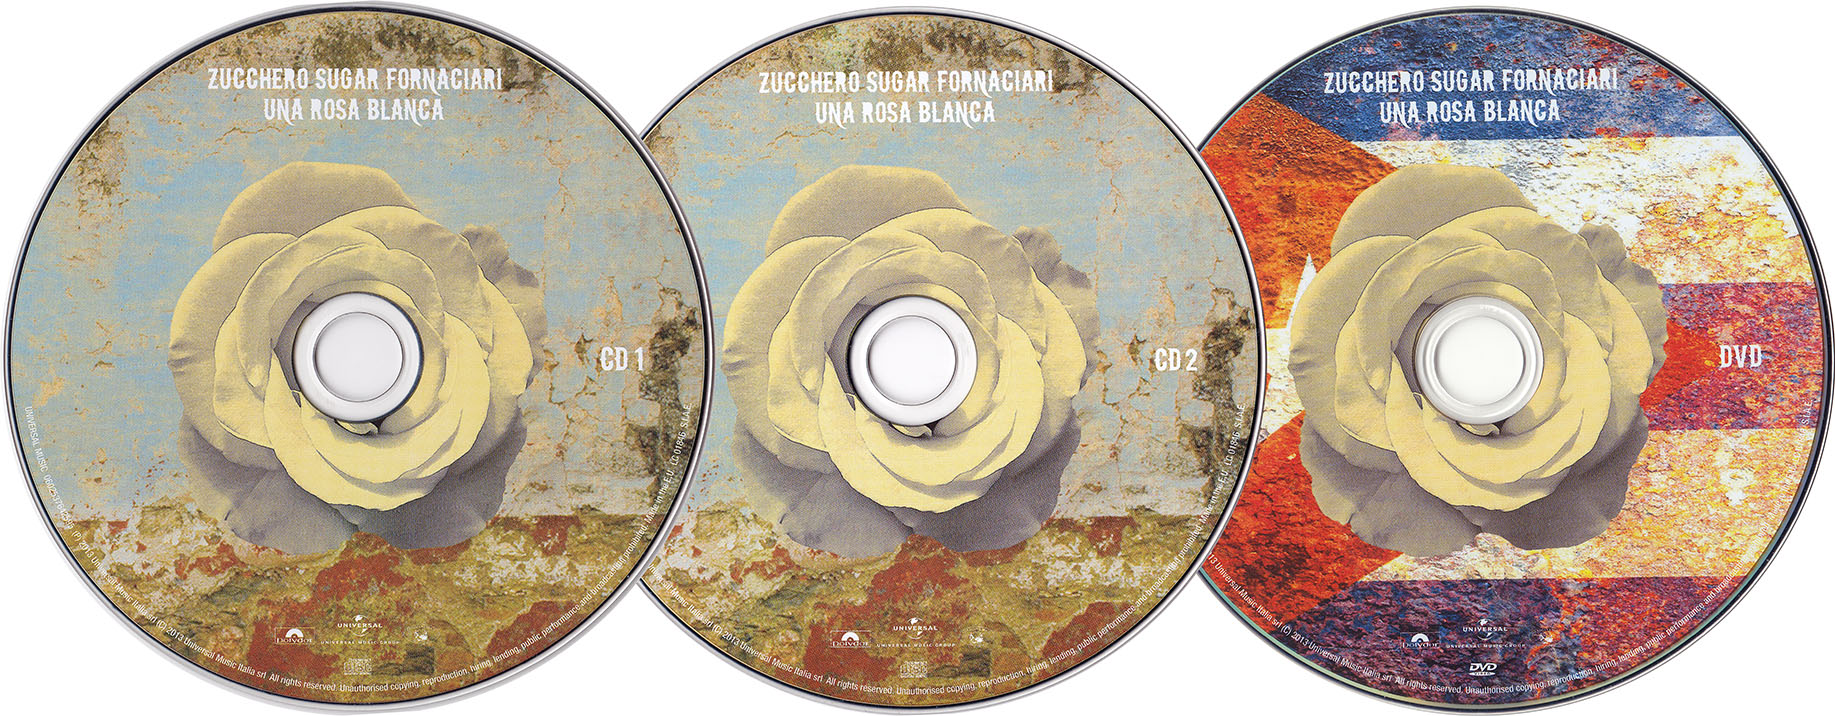 Zucchero Sugar Fornaciari - Una Rosa Blanca (2013) 2CD + DVD9 [Re-Up]